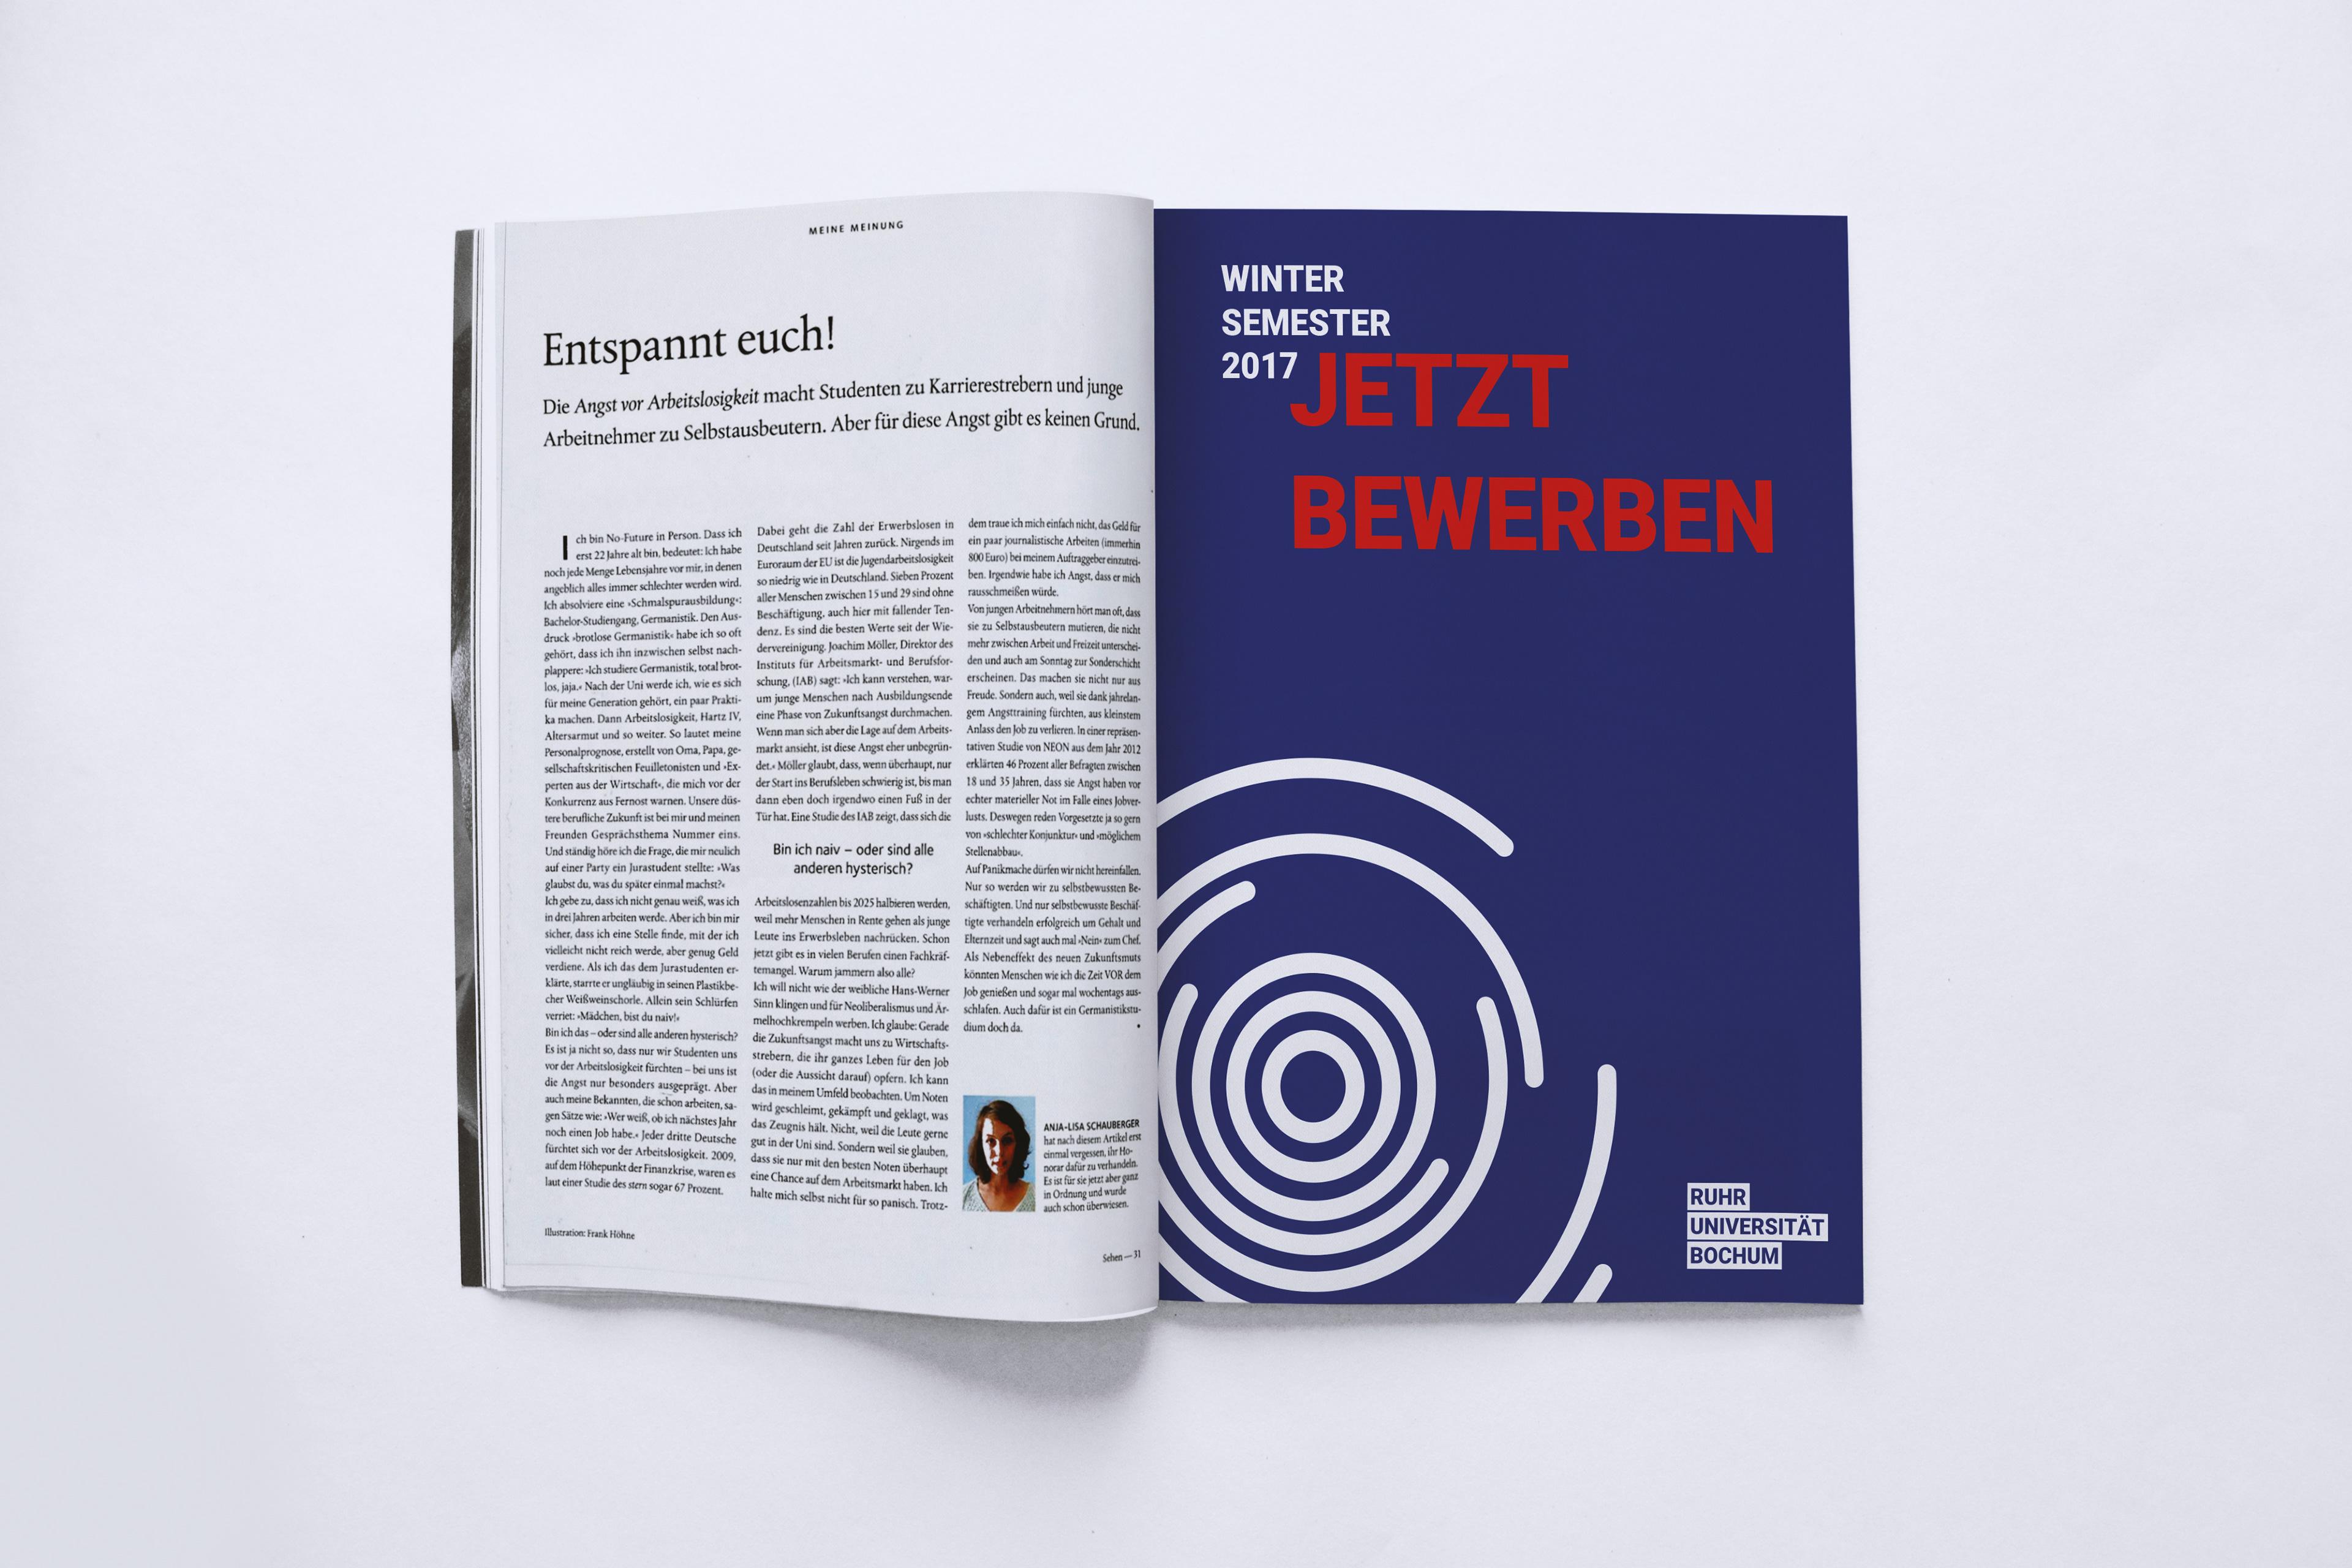 fullscreen - Uni Bochum Bewerbung